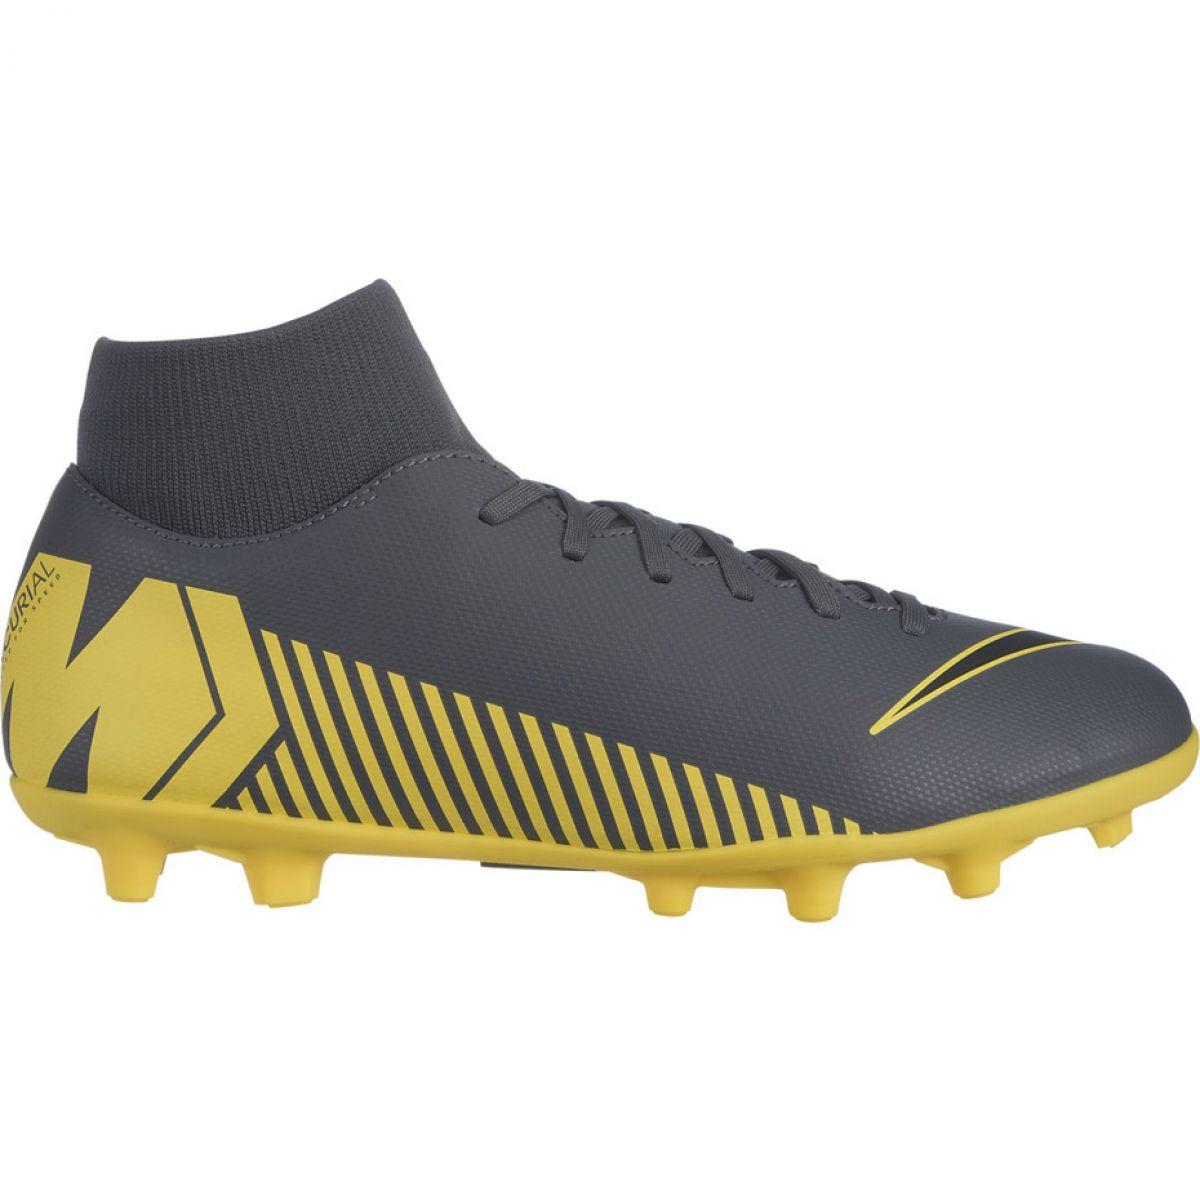 meilleur pas cher 64a4b 0bd55 Chaussures de foot Nike Mercurial Superfly 6 Club Mg AH7363-070